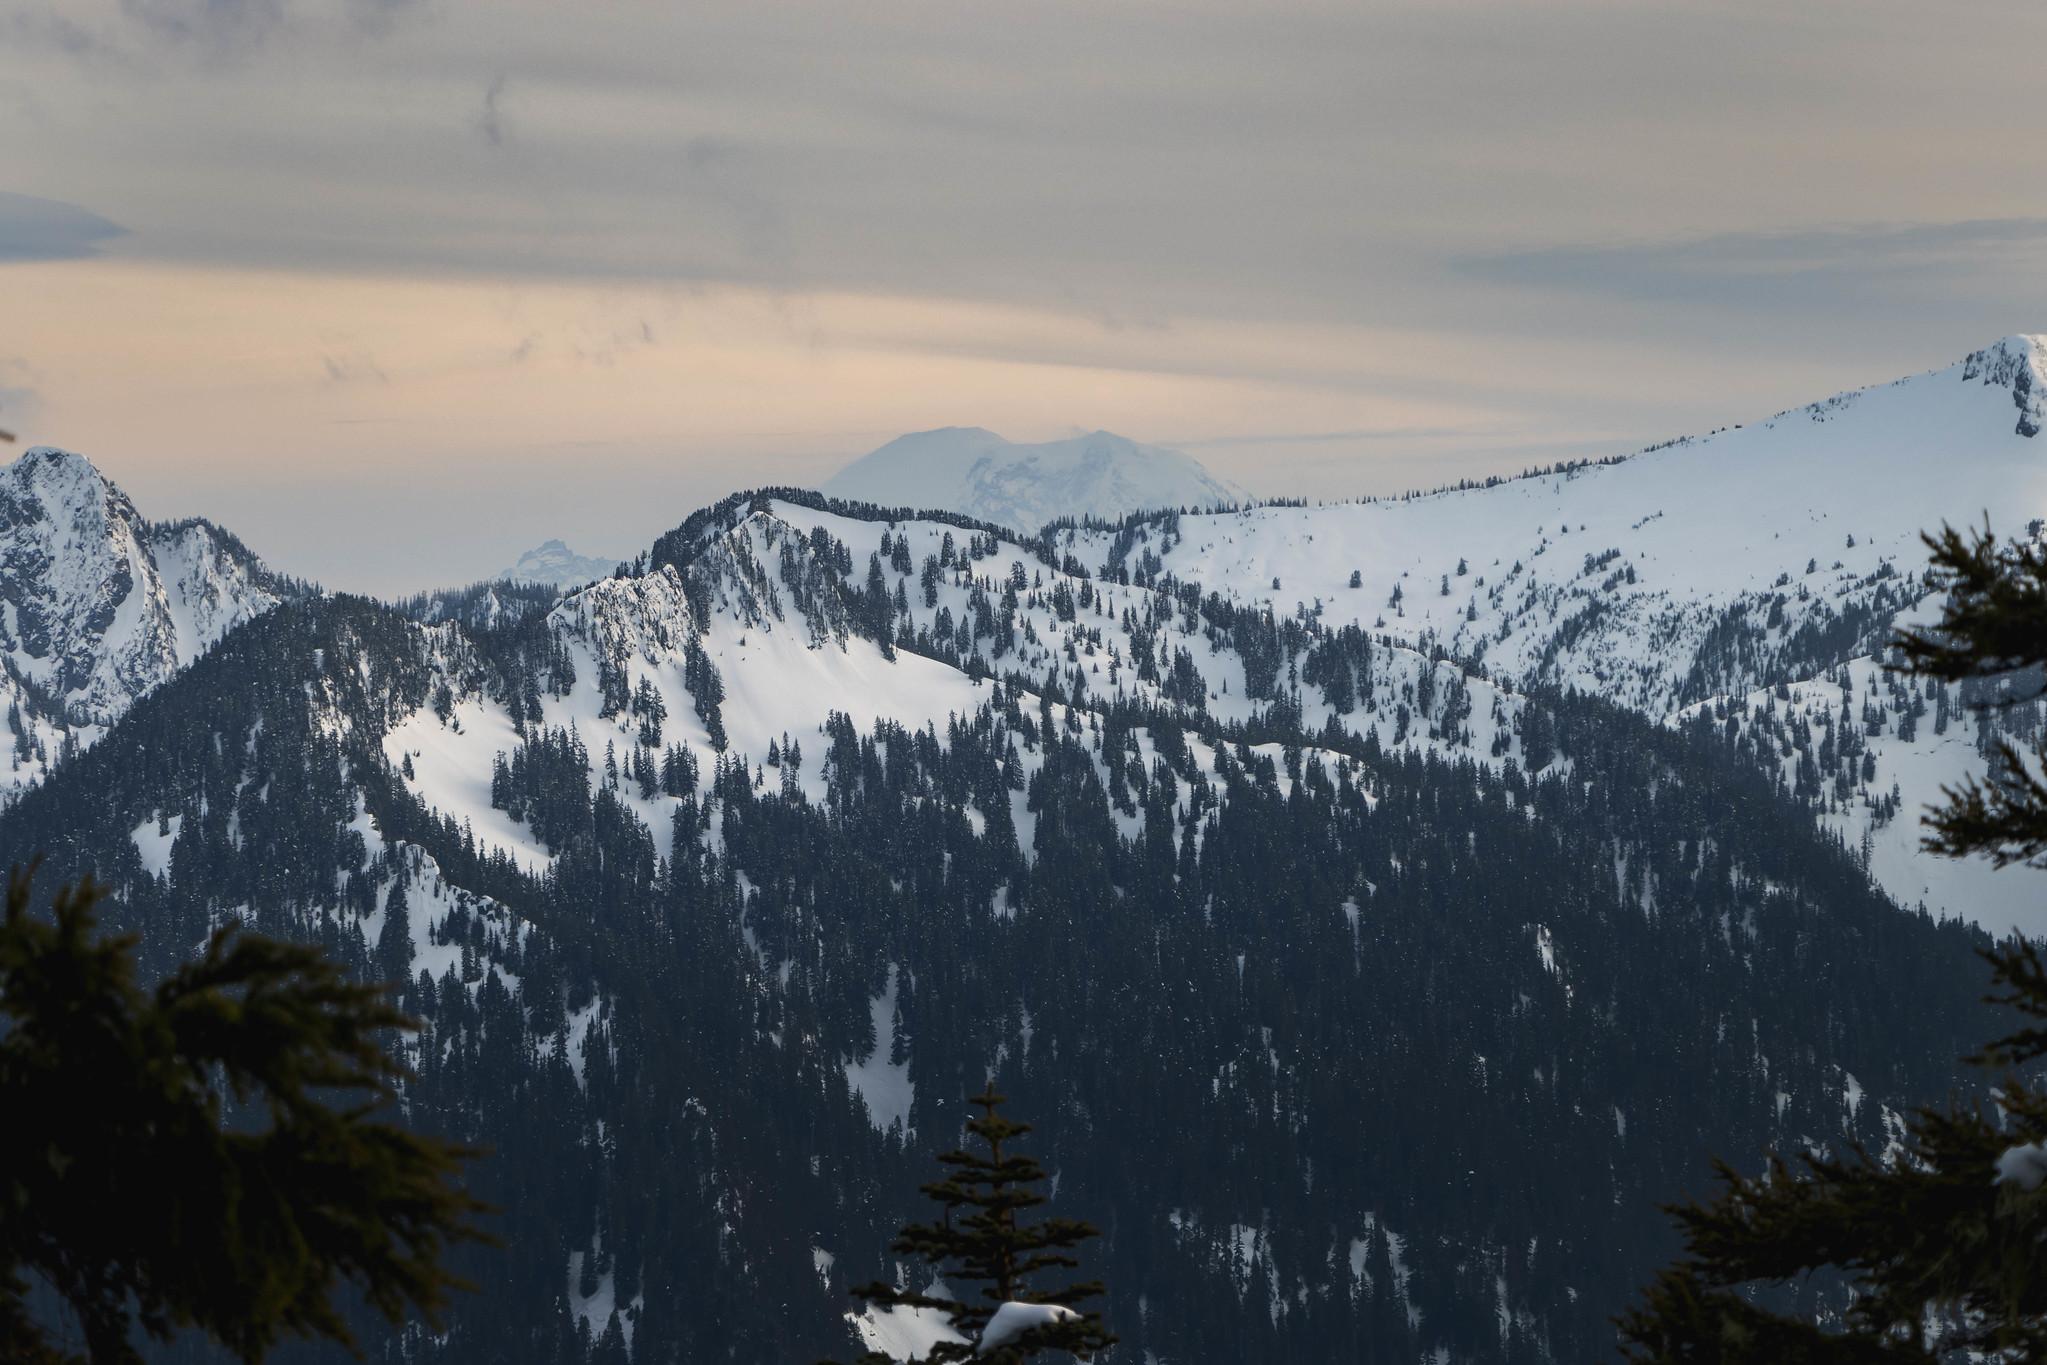 Mount Rainier's send-off